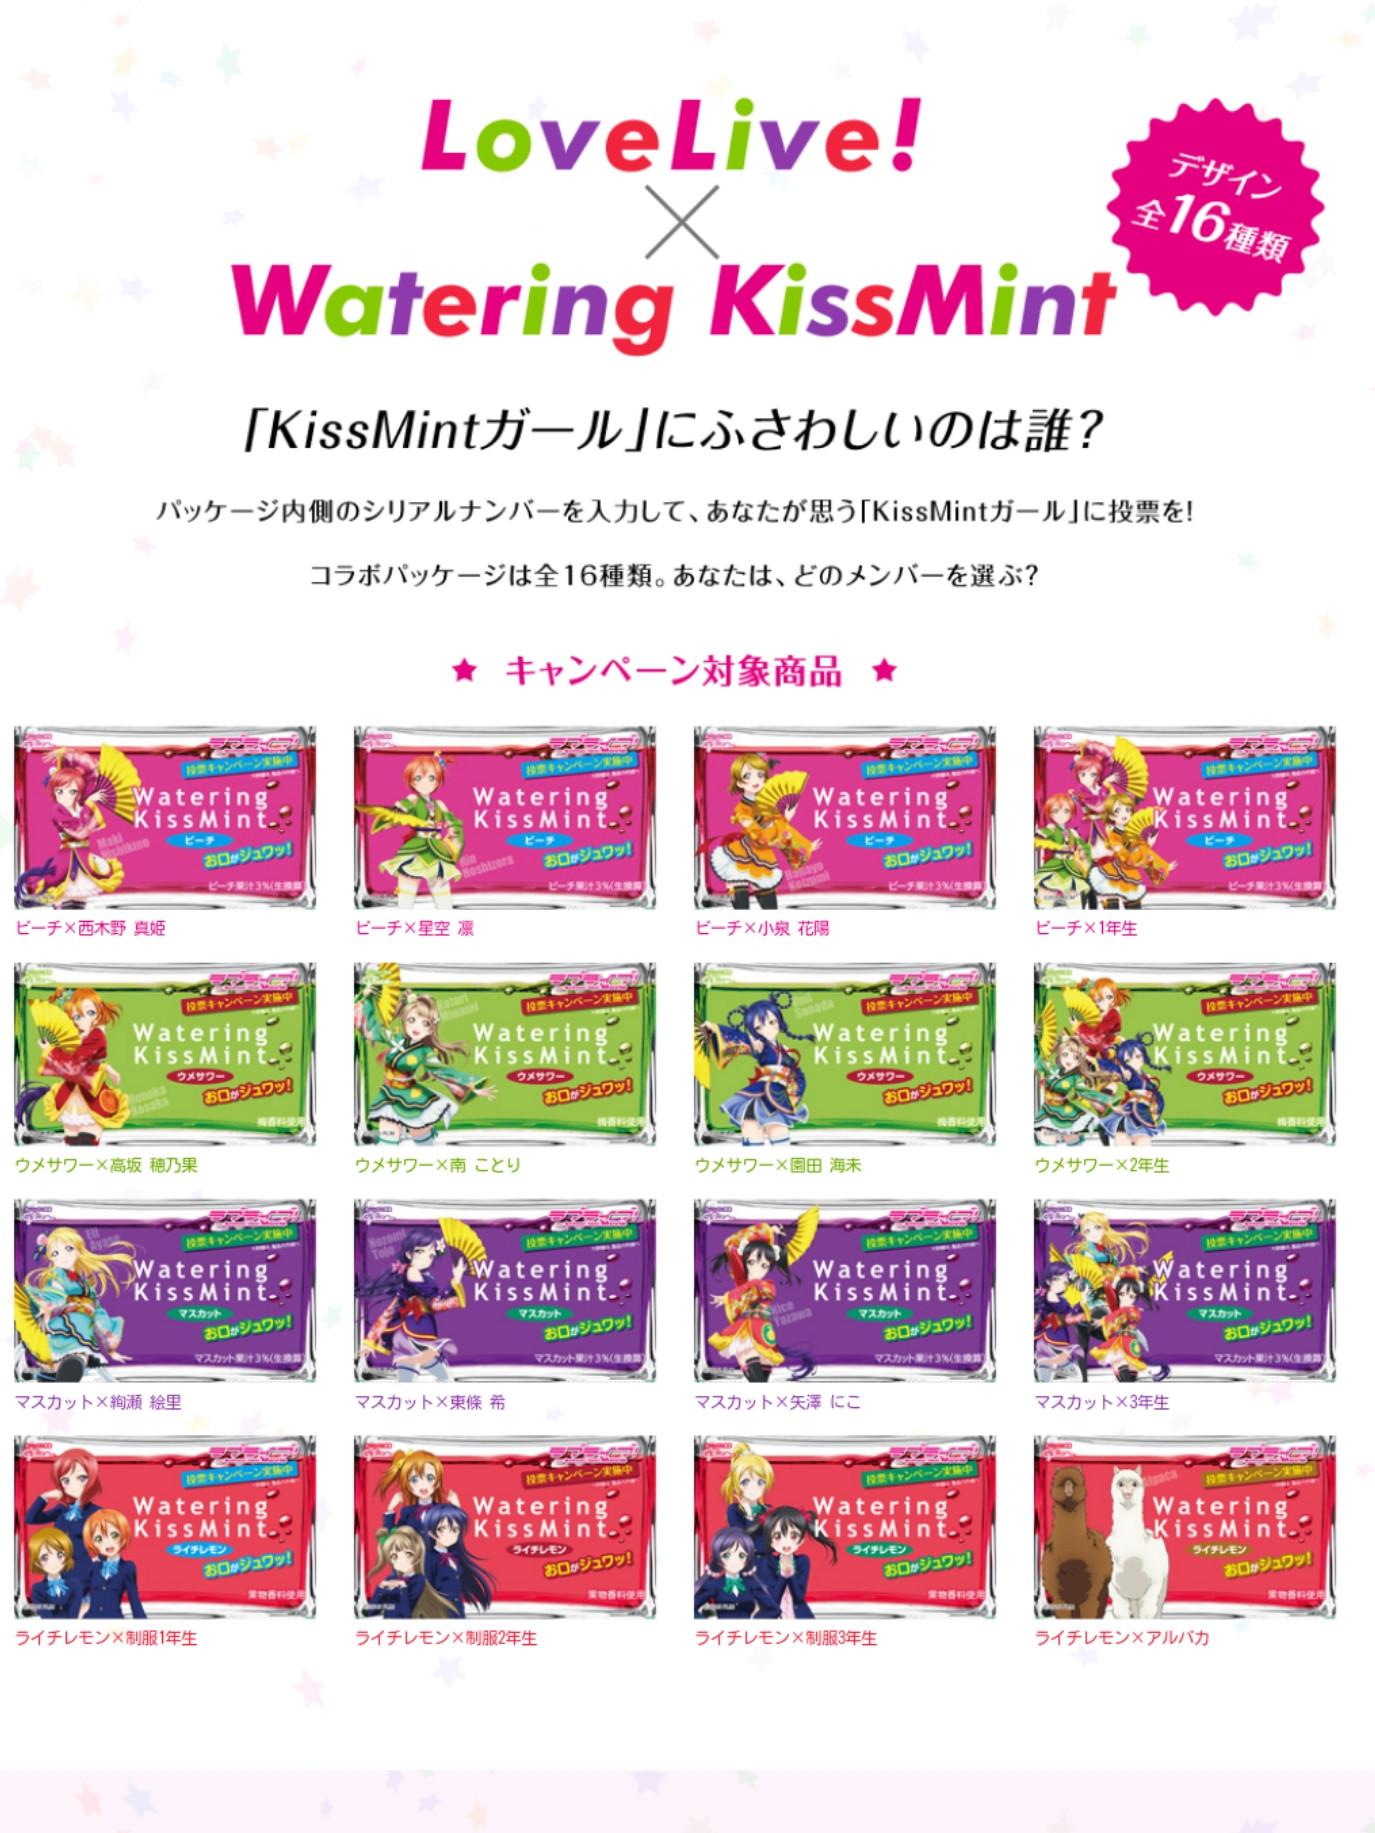 Love Live!'s Maki Nishikino Steals the Spotlight in Newly Animated Chewing Gum Ad